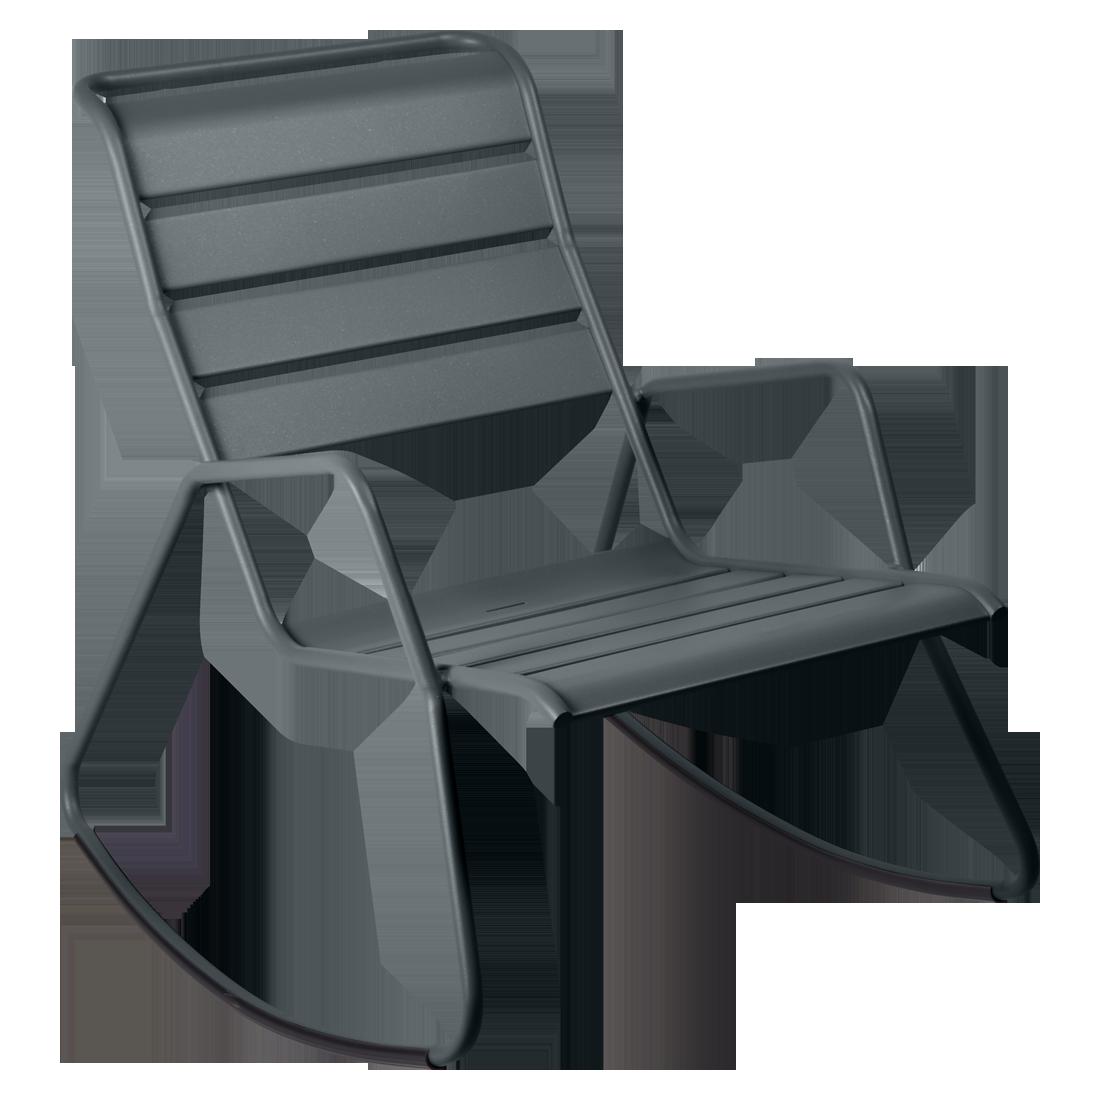 rocking chair metal, rocking chair fermob, rocking chair jardin, rocking chair gris